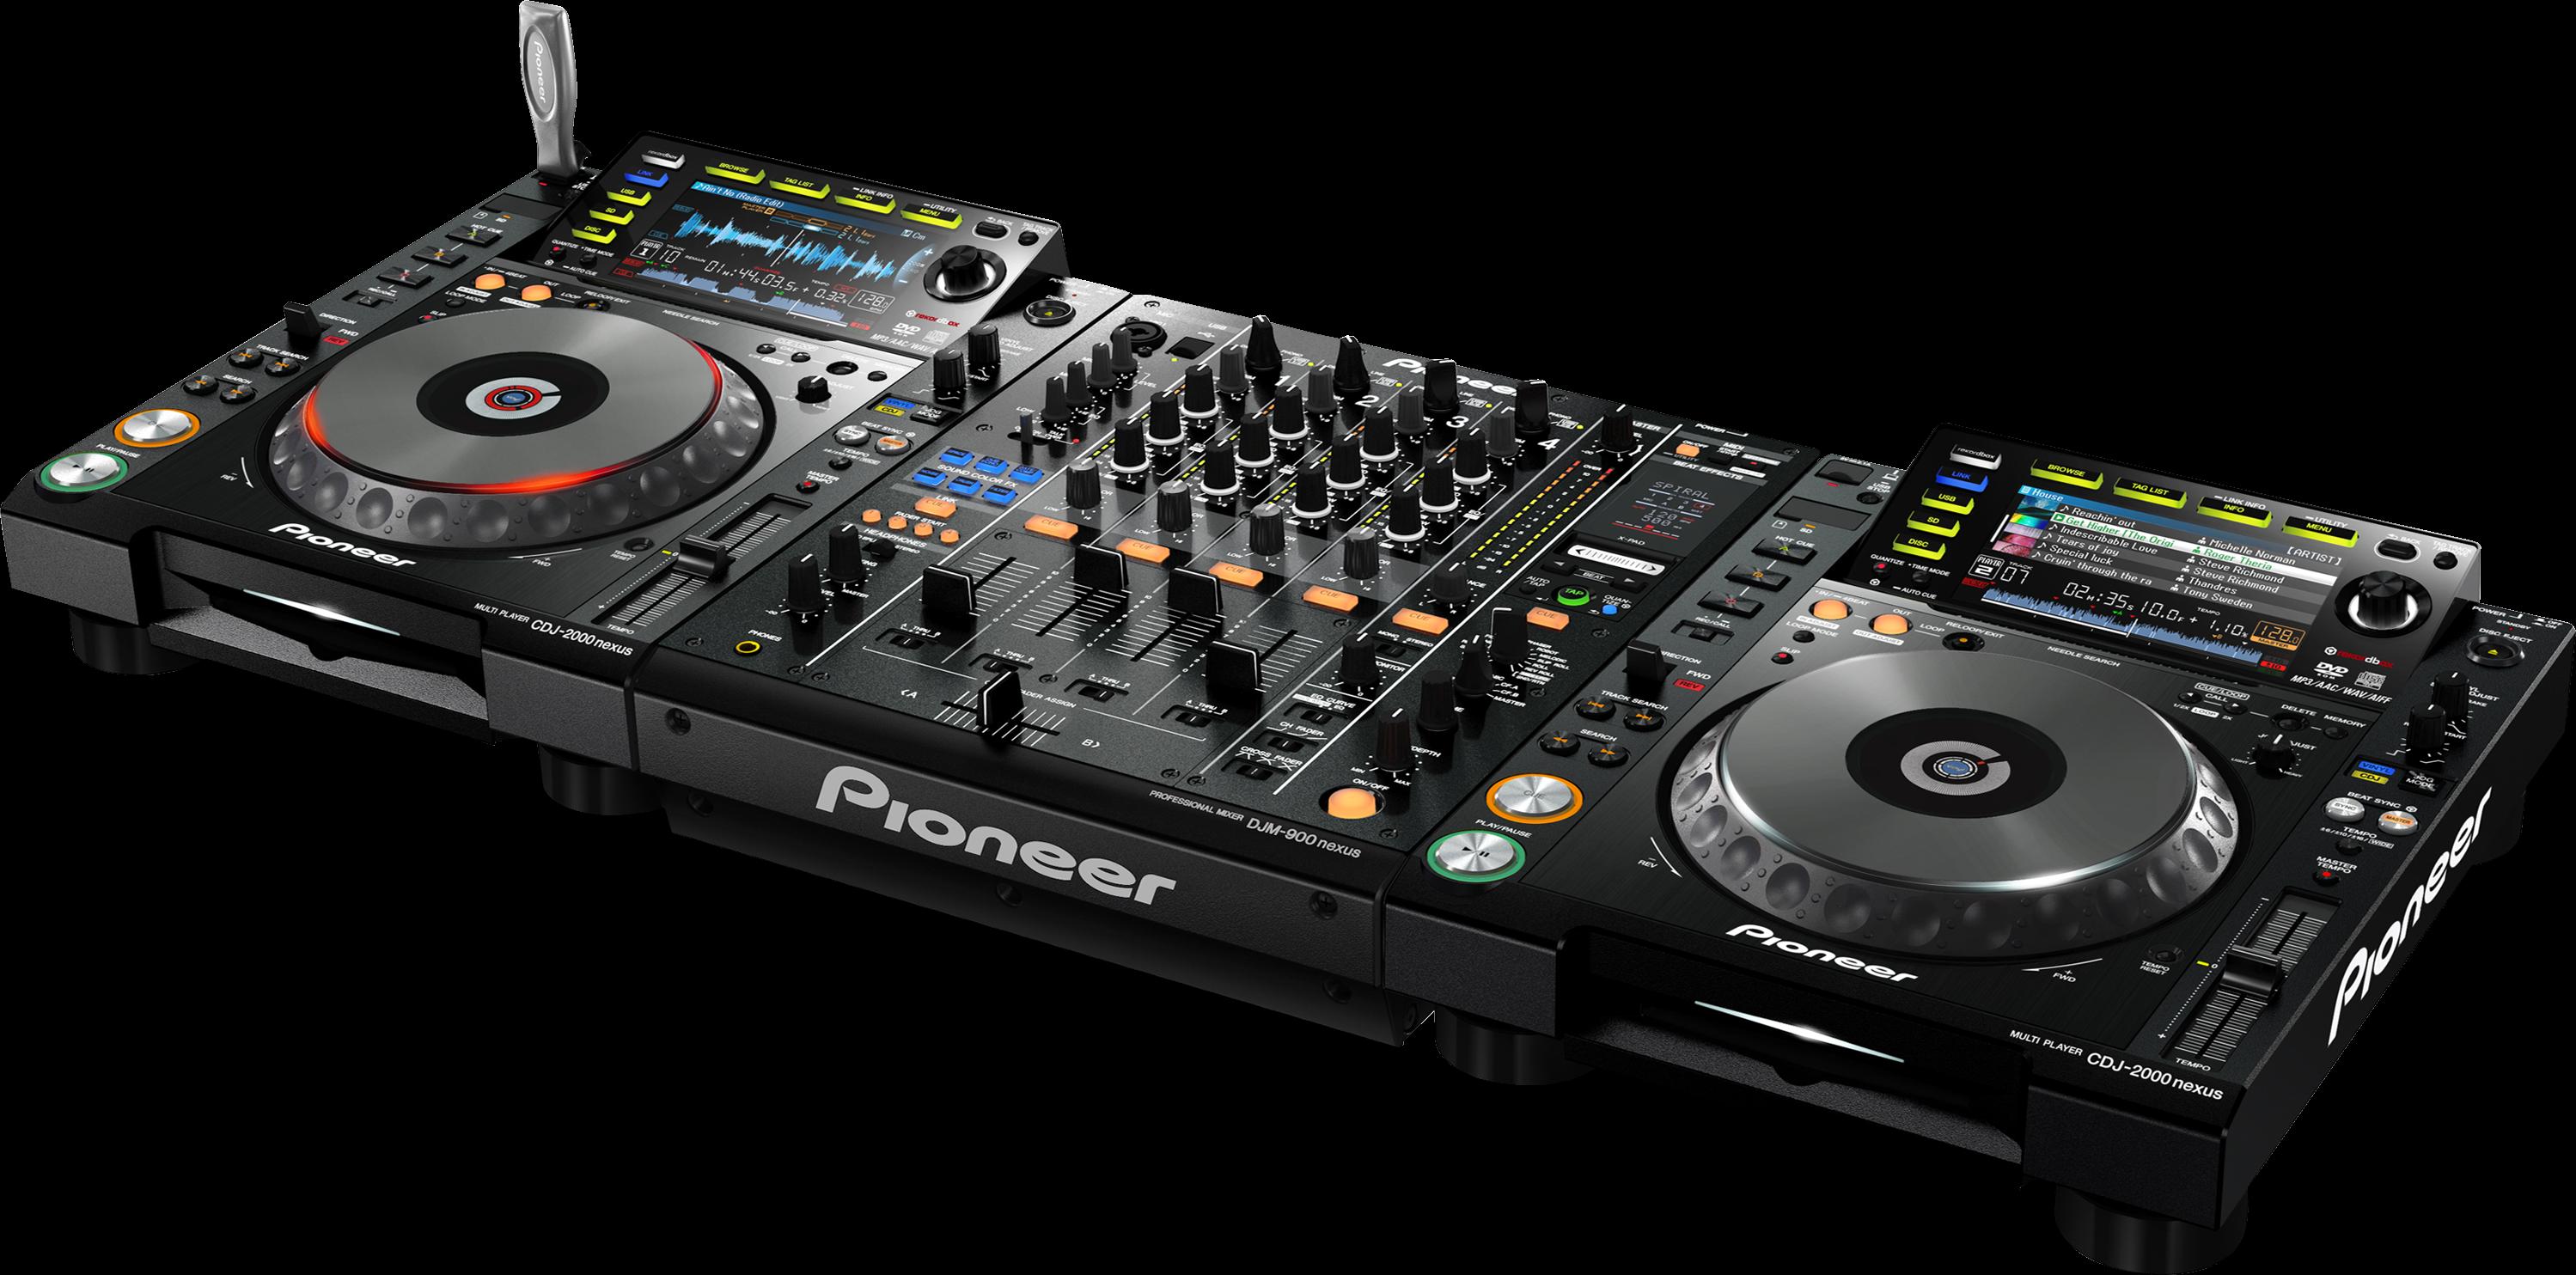 CDJ-2000NXS set with DJM-900NXS angle